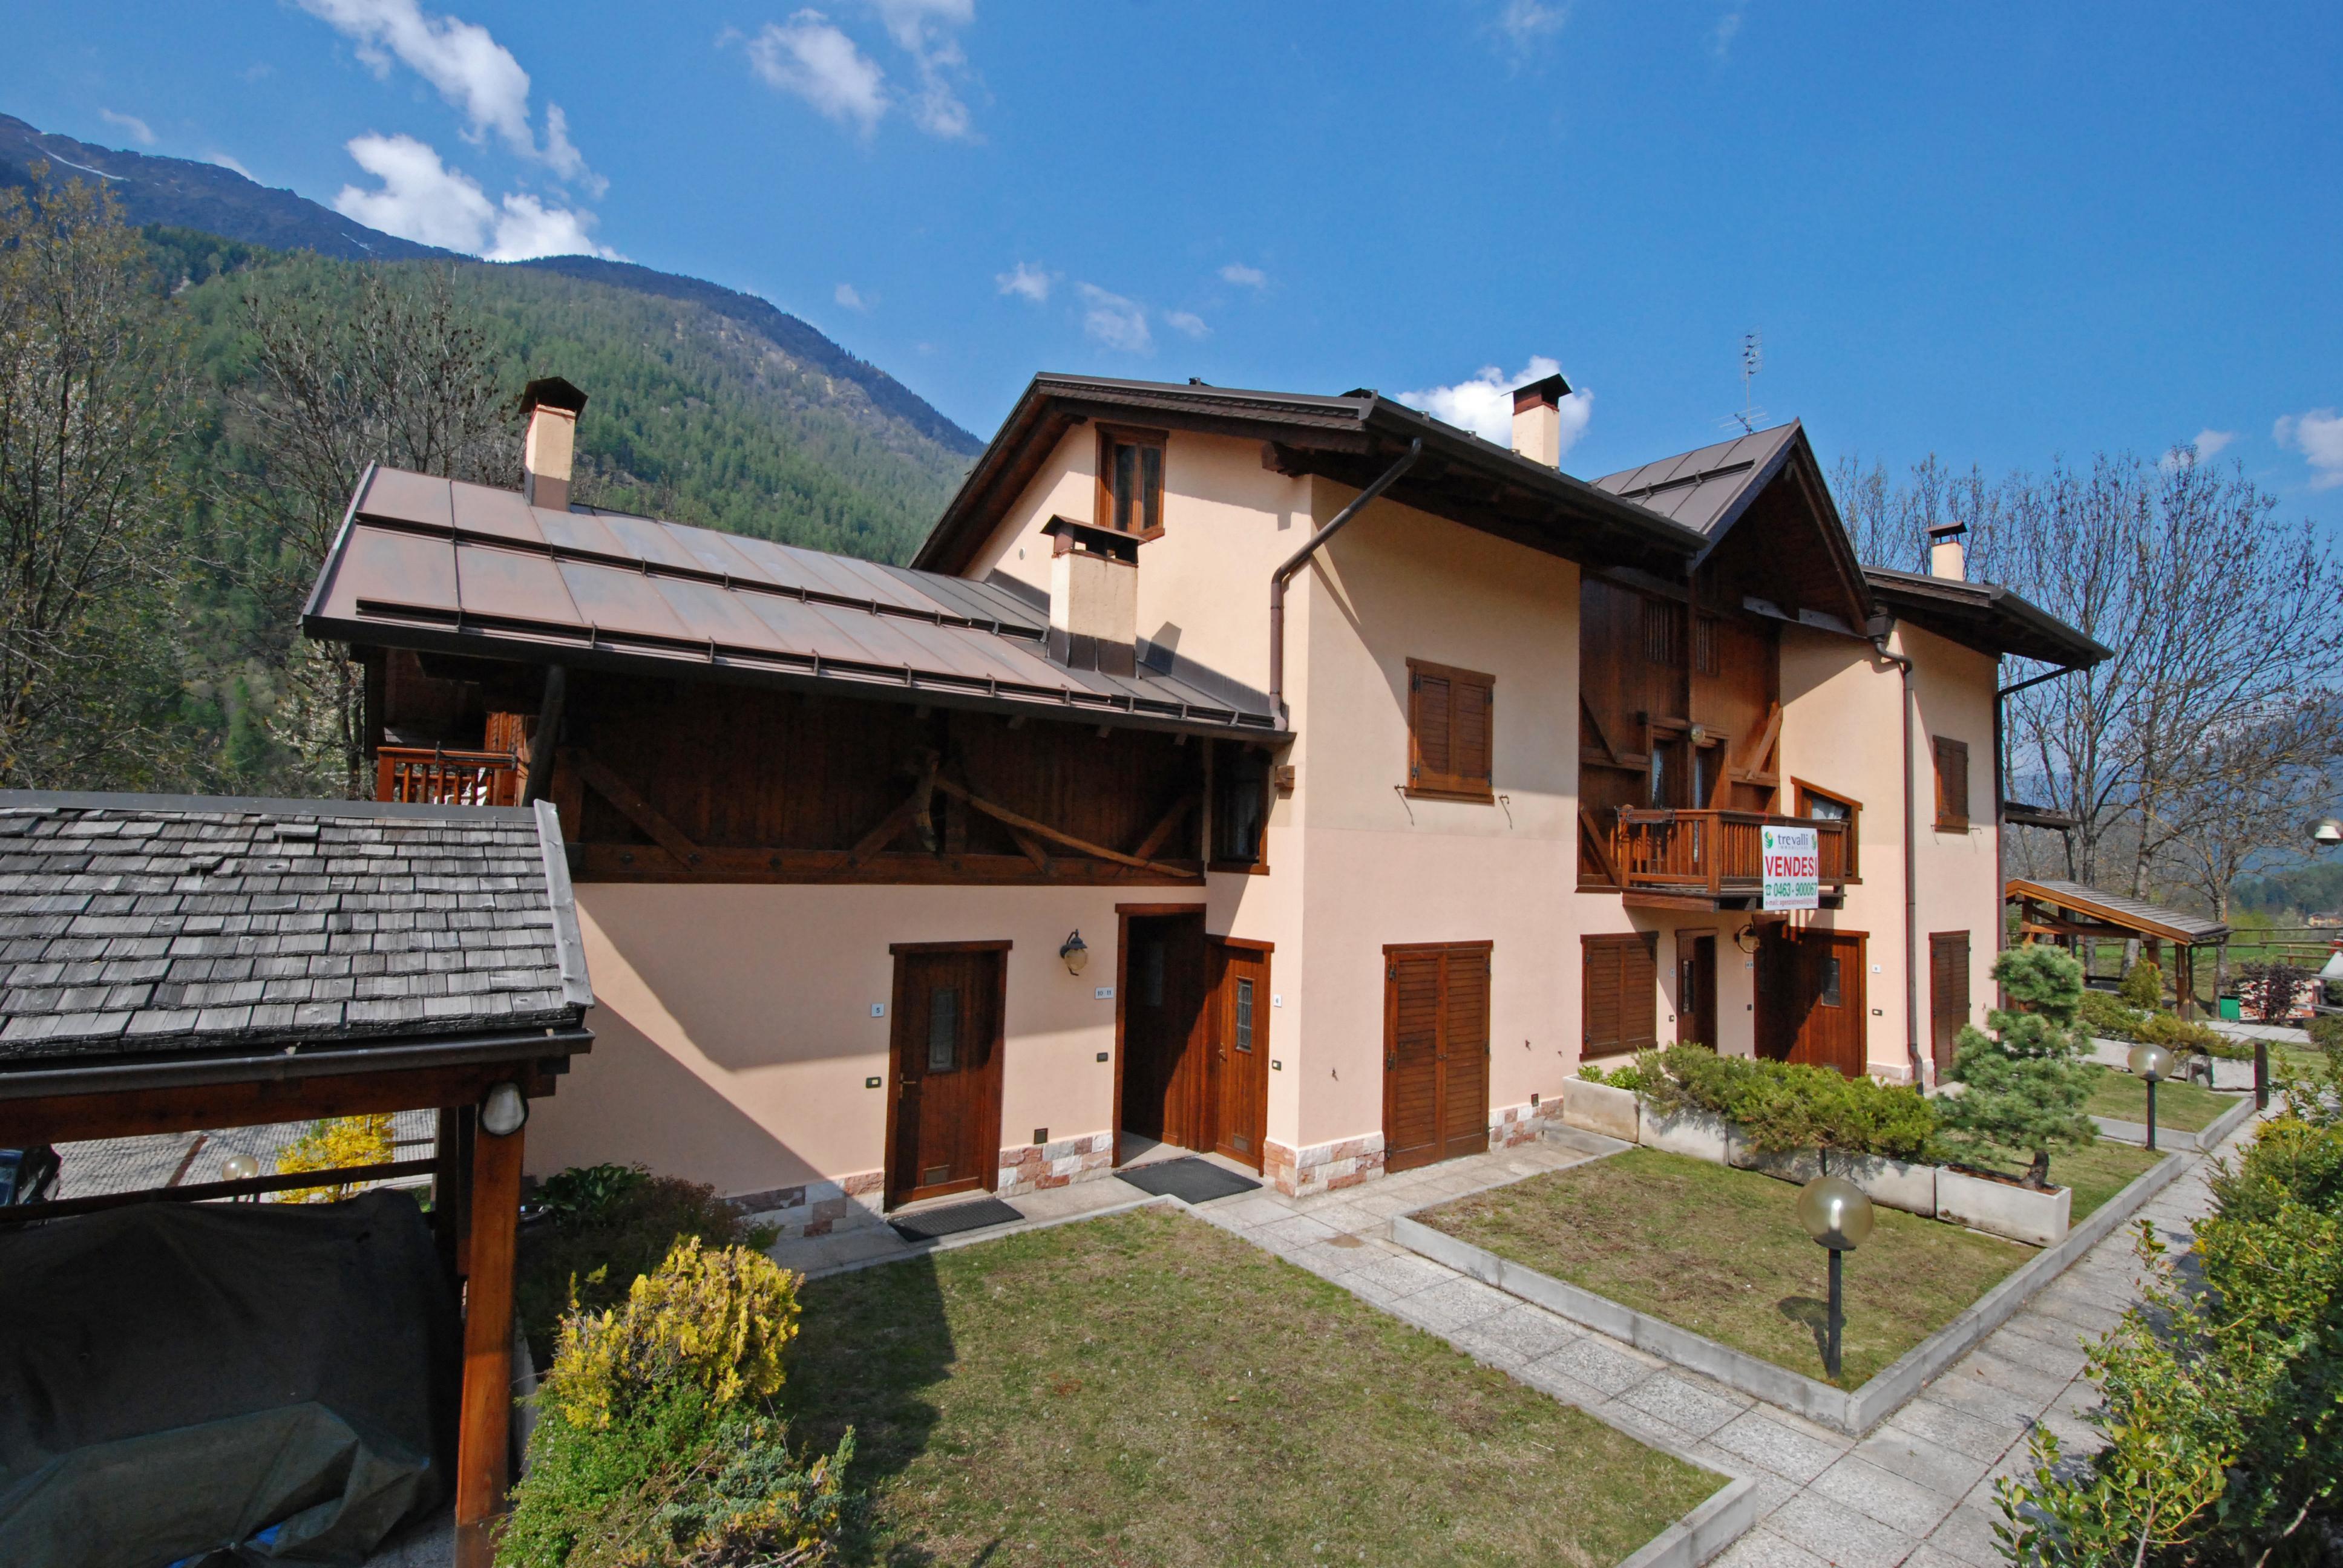 Appartamento Palazzina Sole a Mezzana Marilleva Italia IT3645 450 3